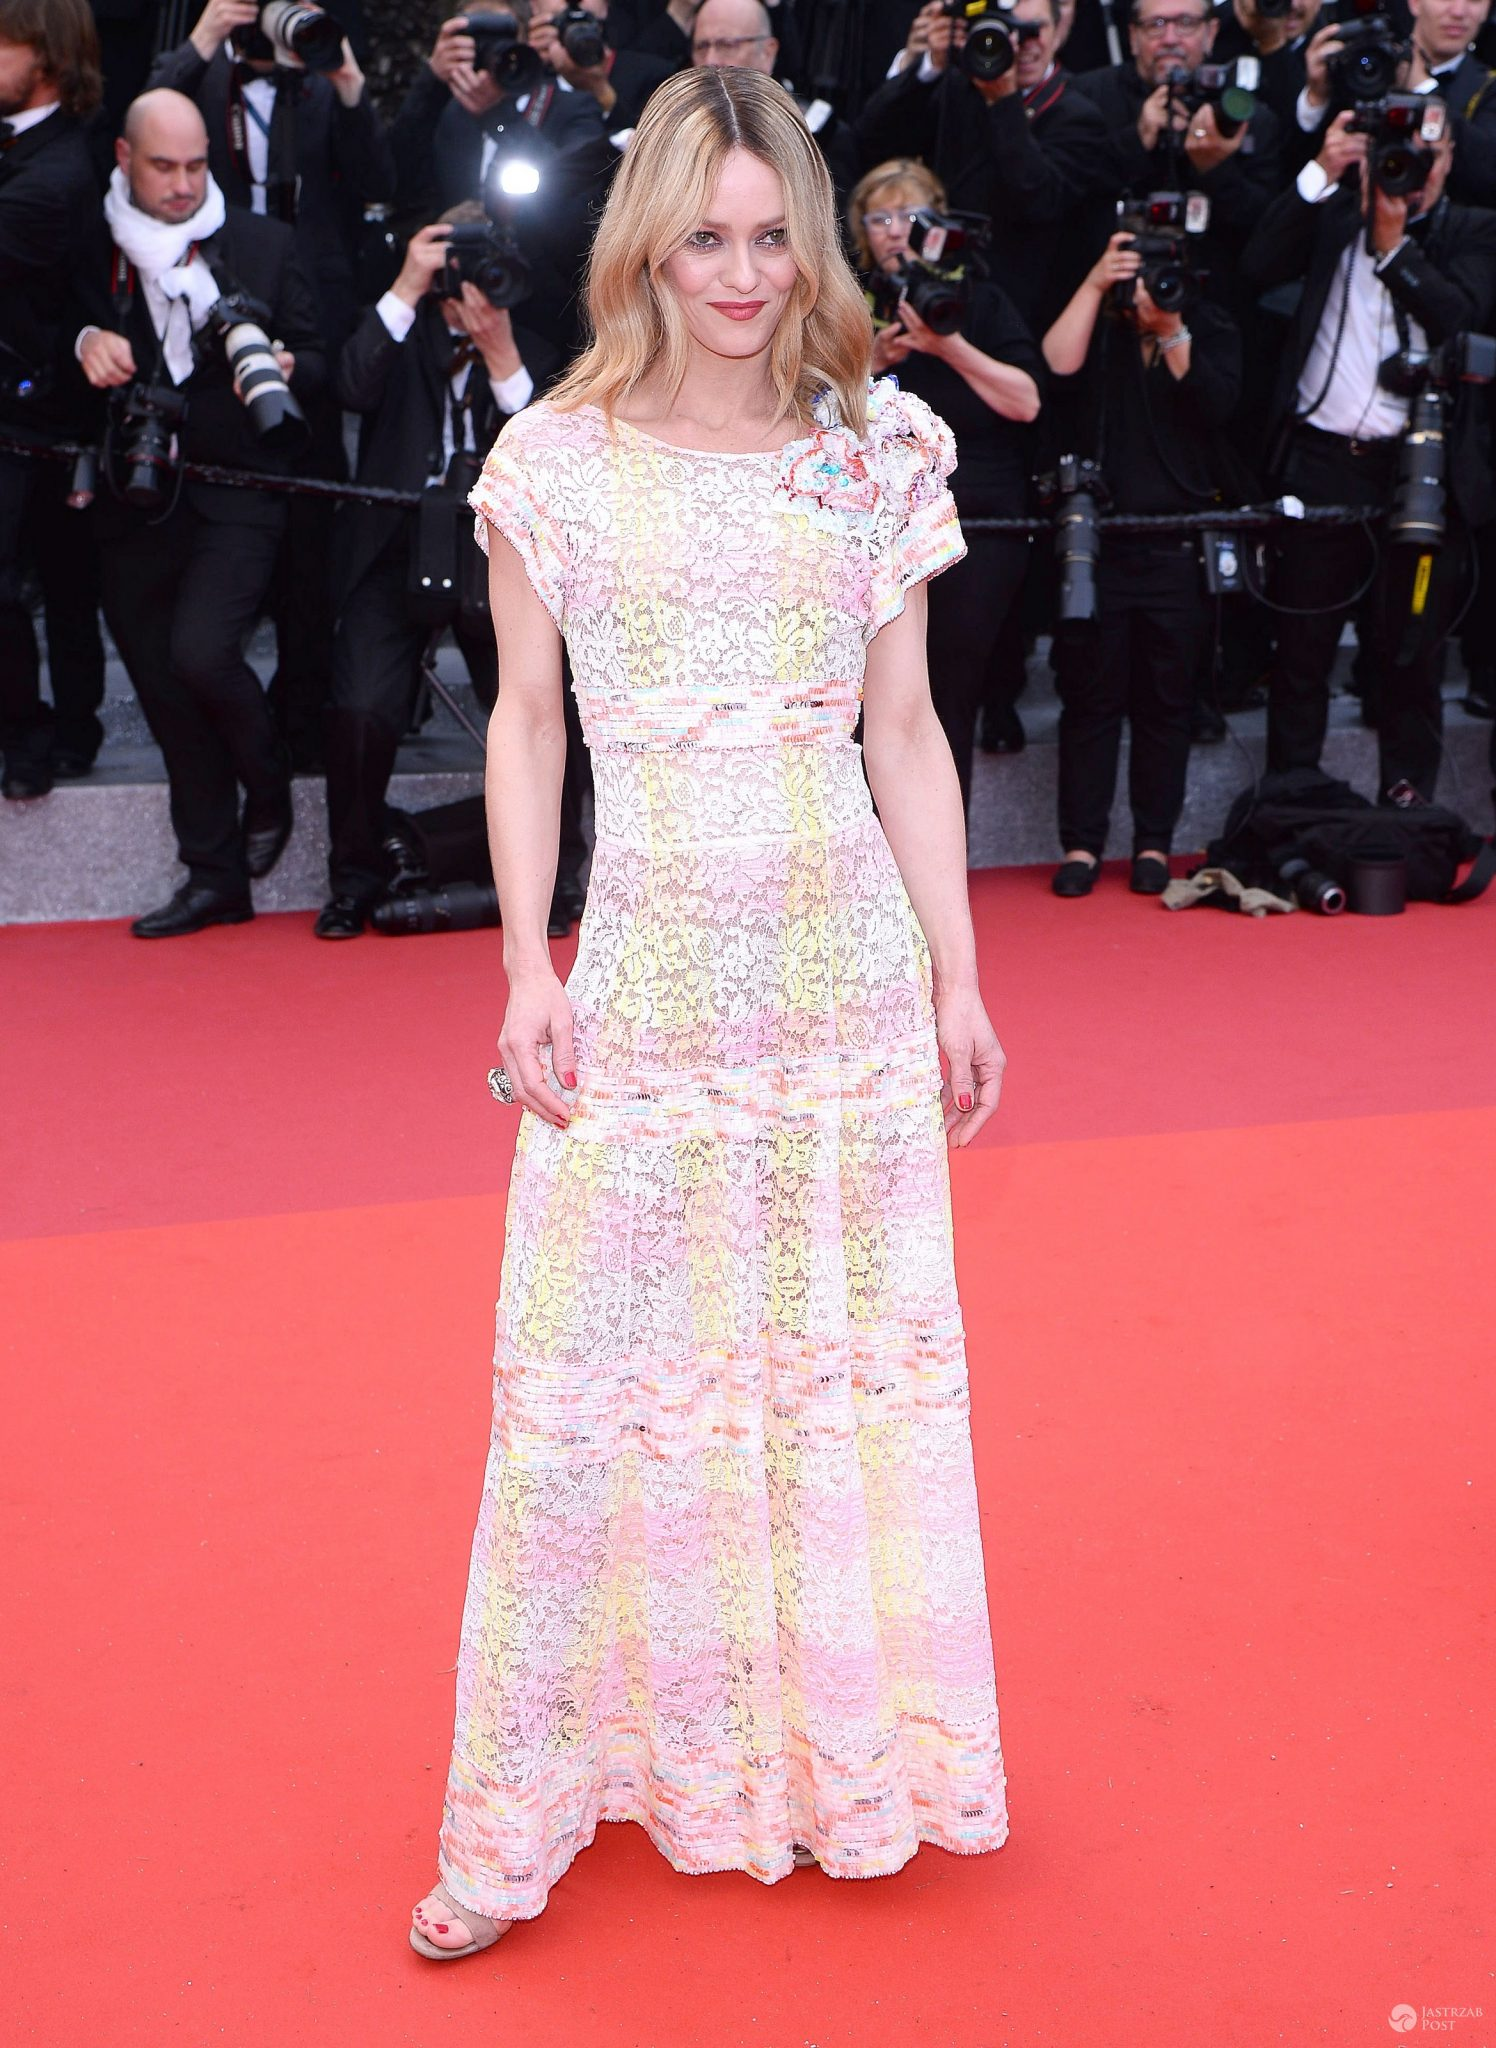 Gala otwarcia Cannes 2016: Vanessa Paradis. Kreacja: Chanel (fot. ONS)